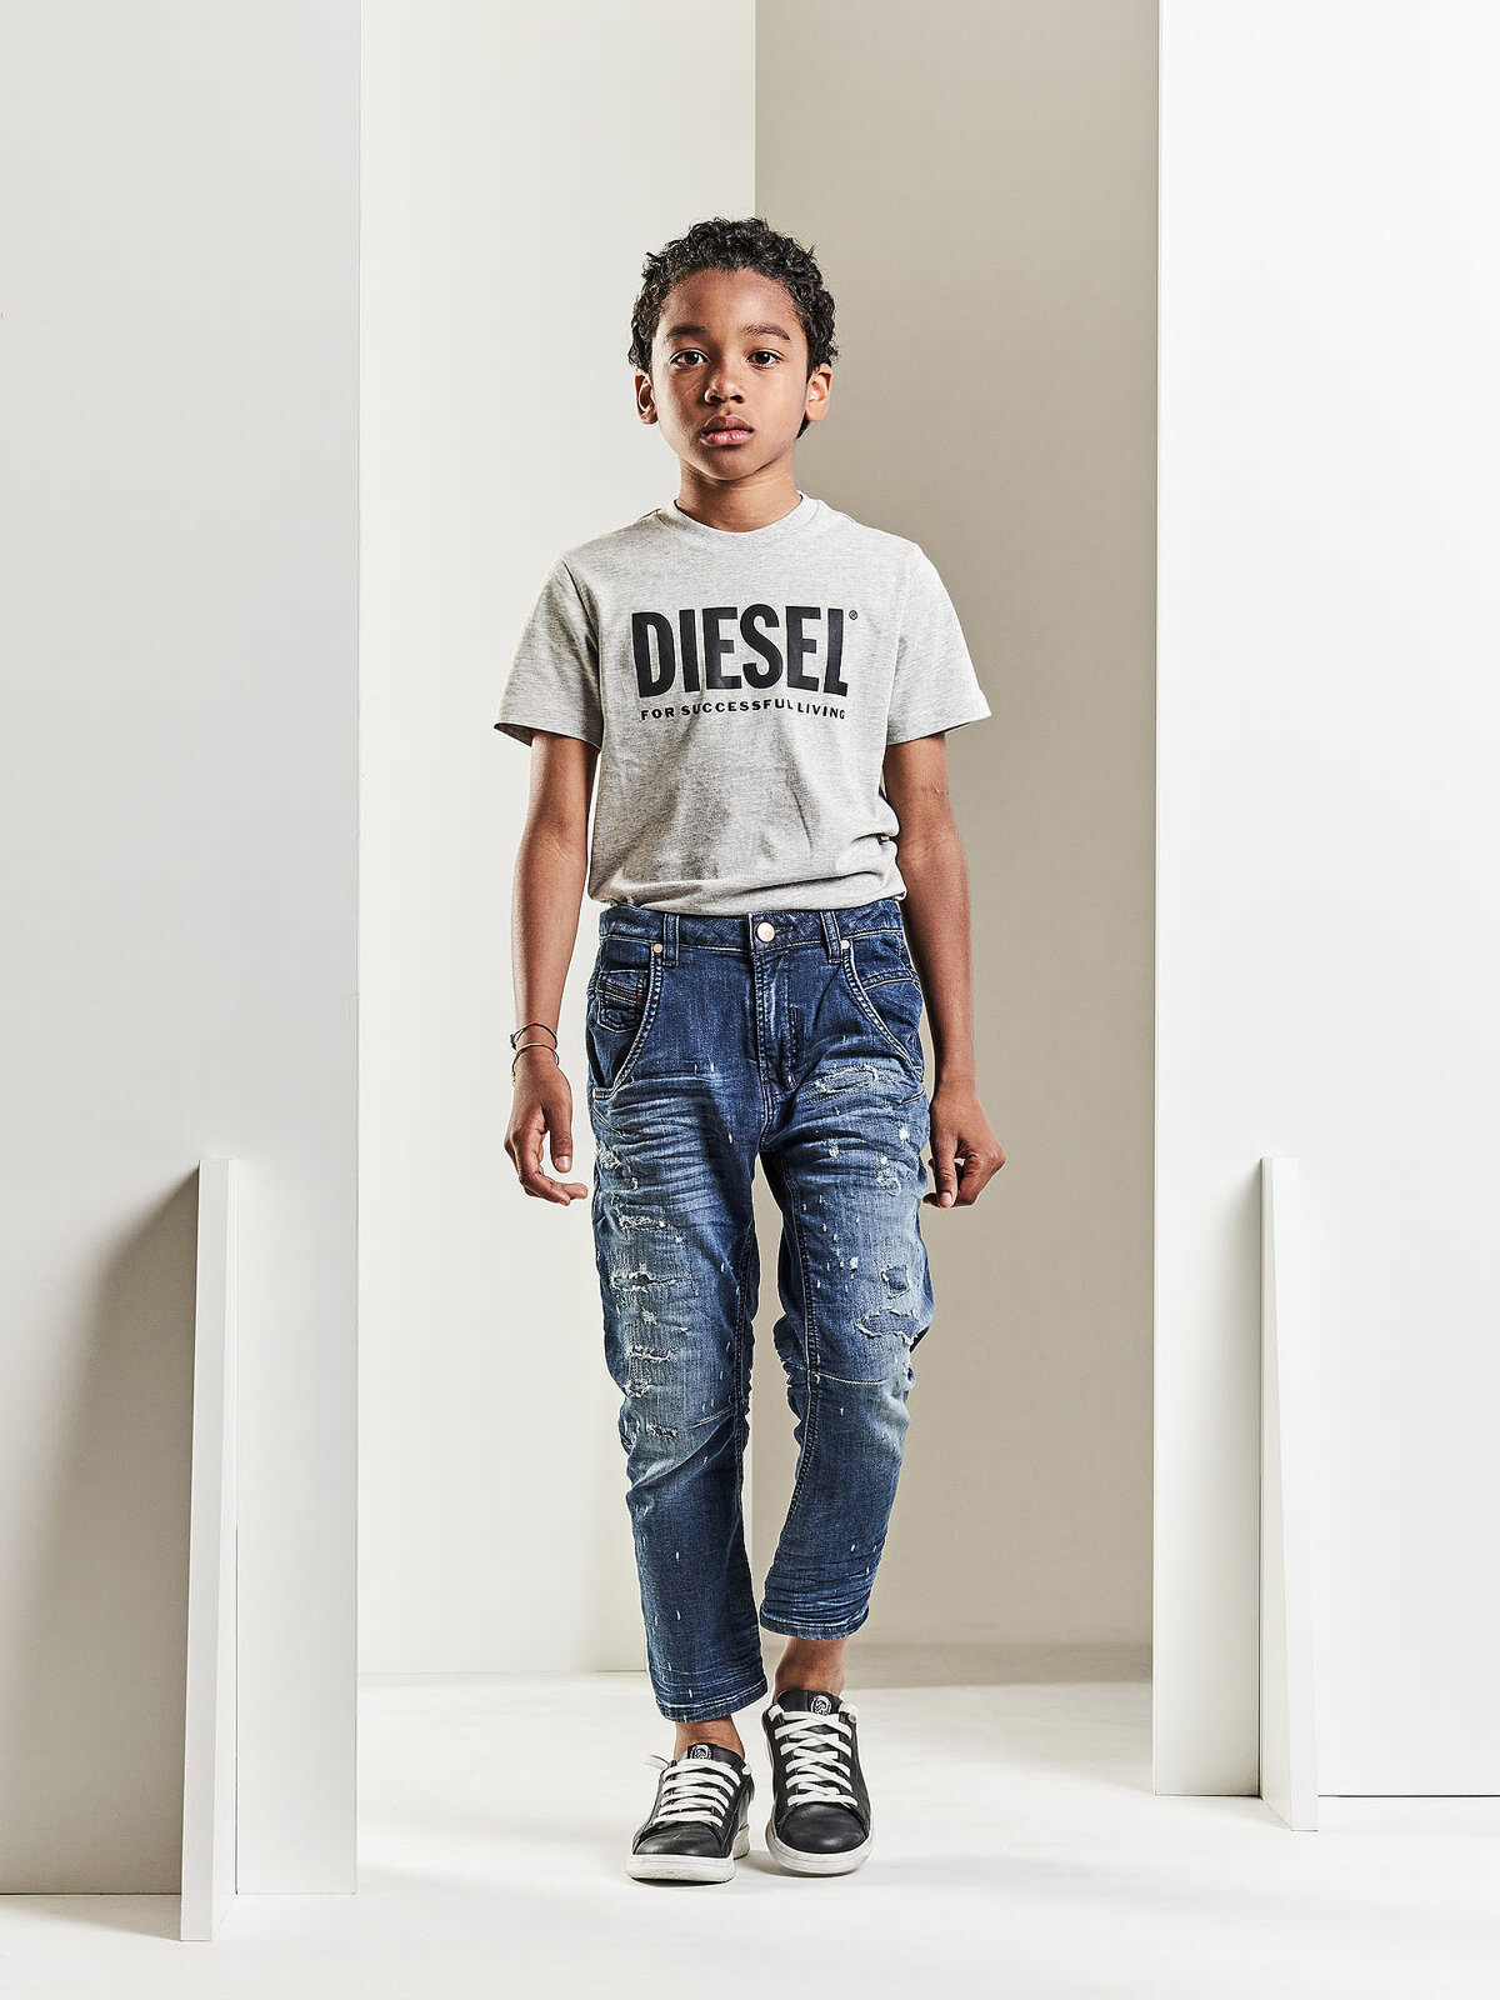 Fayza-J Jjj-N Pants - Diesel Kid